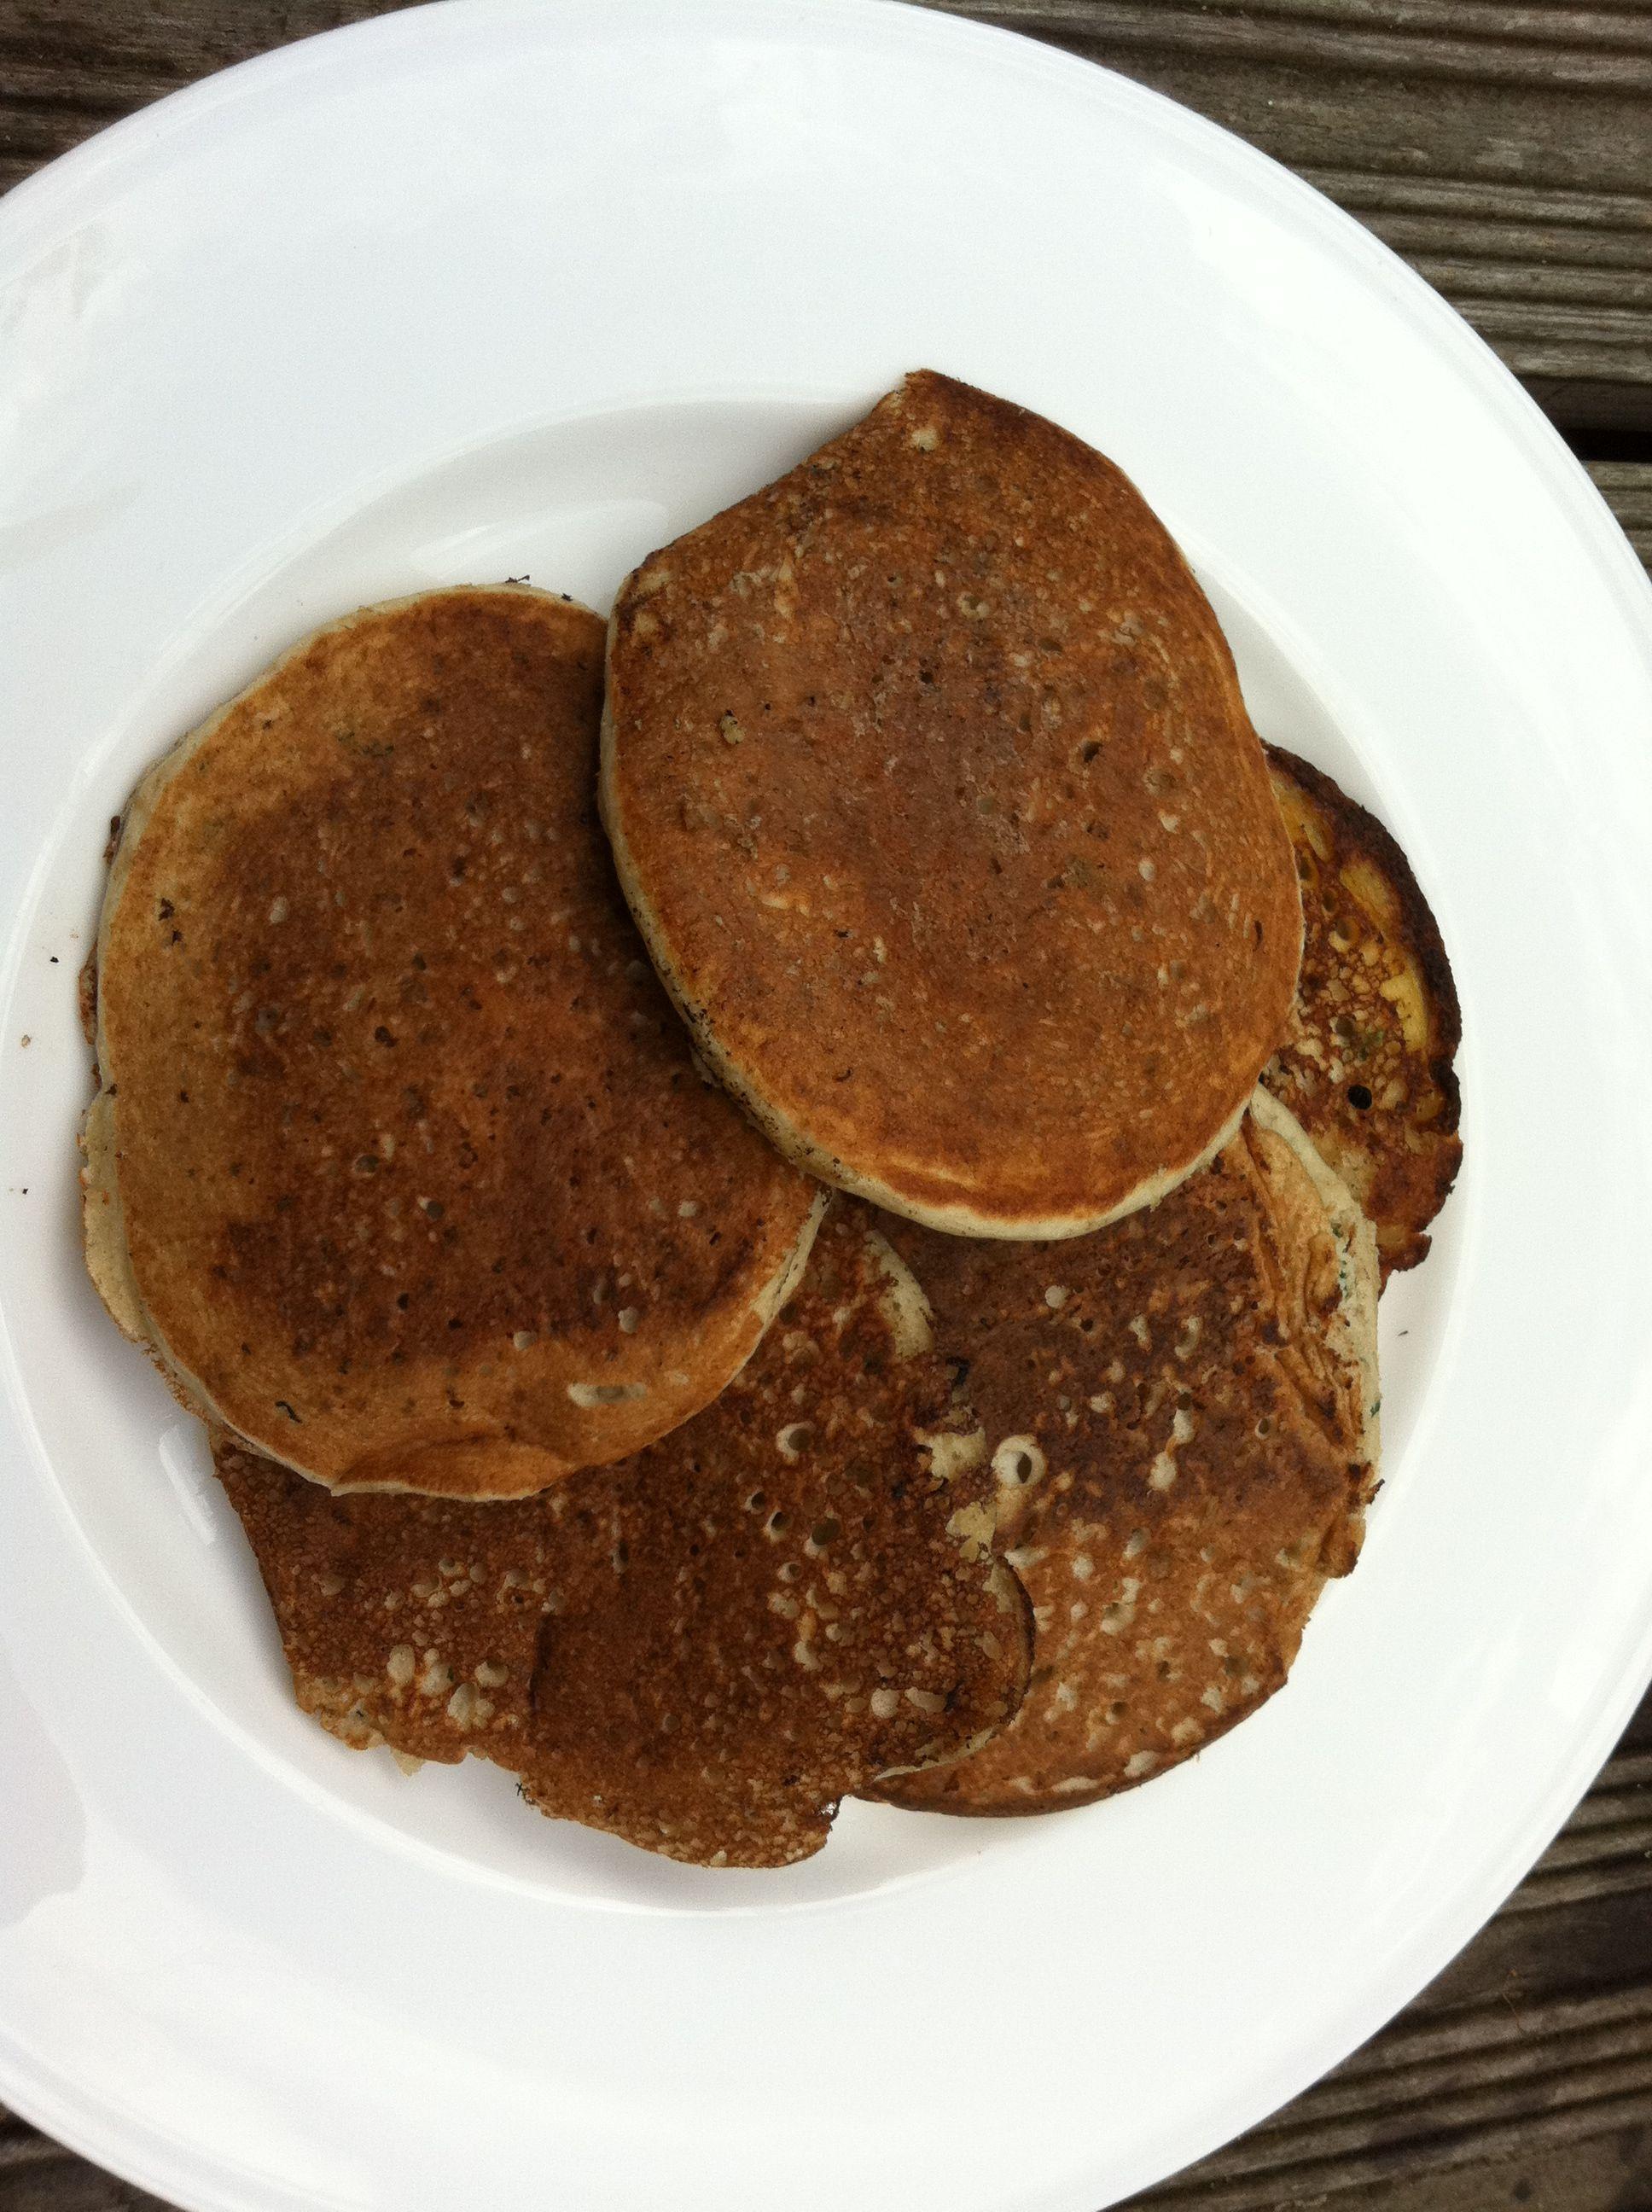 Oat and Buckwheat Pancakes: 50g rolled oats 350ml boiling water 75g natural yogurt 1/2 fast action yeast 200g buckwheat flour 1/2 tsp salt 2 medium free range eggs 1 tsp baking powder